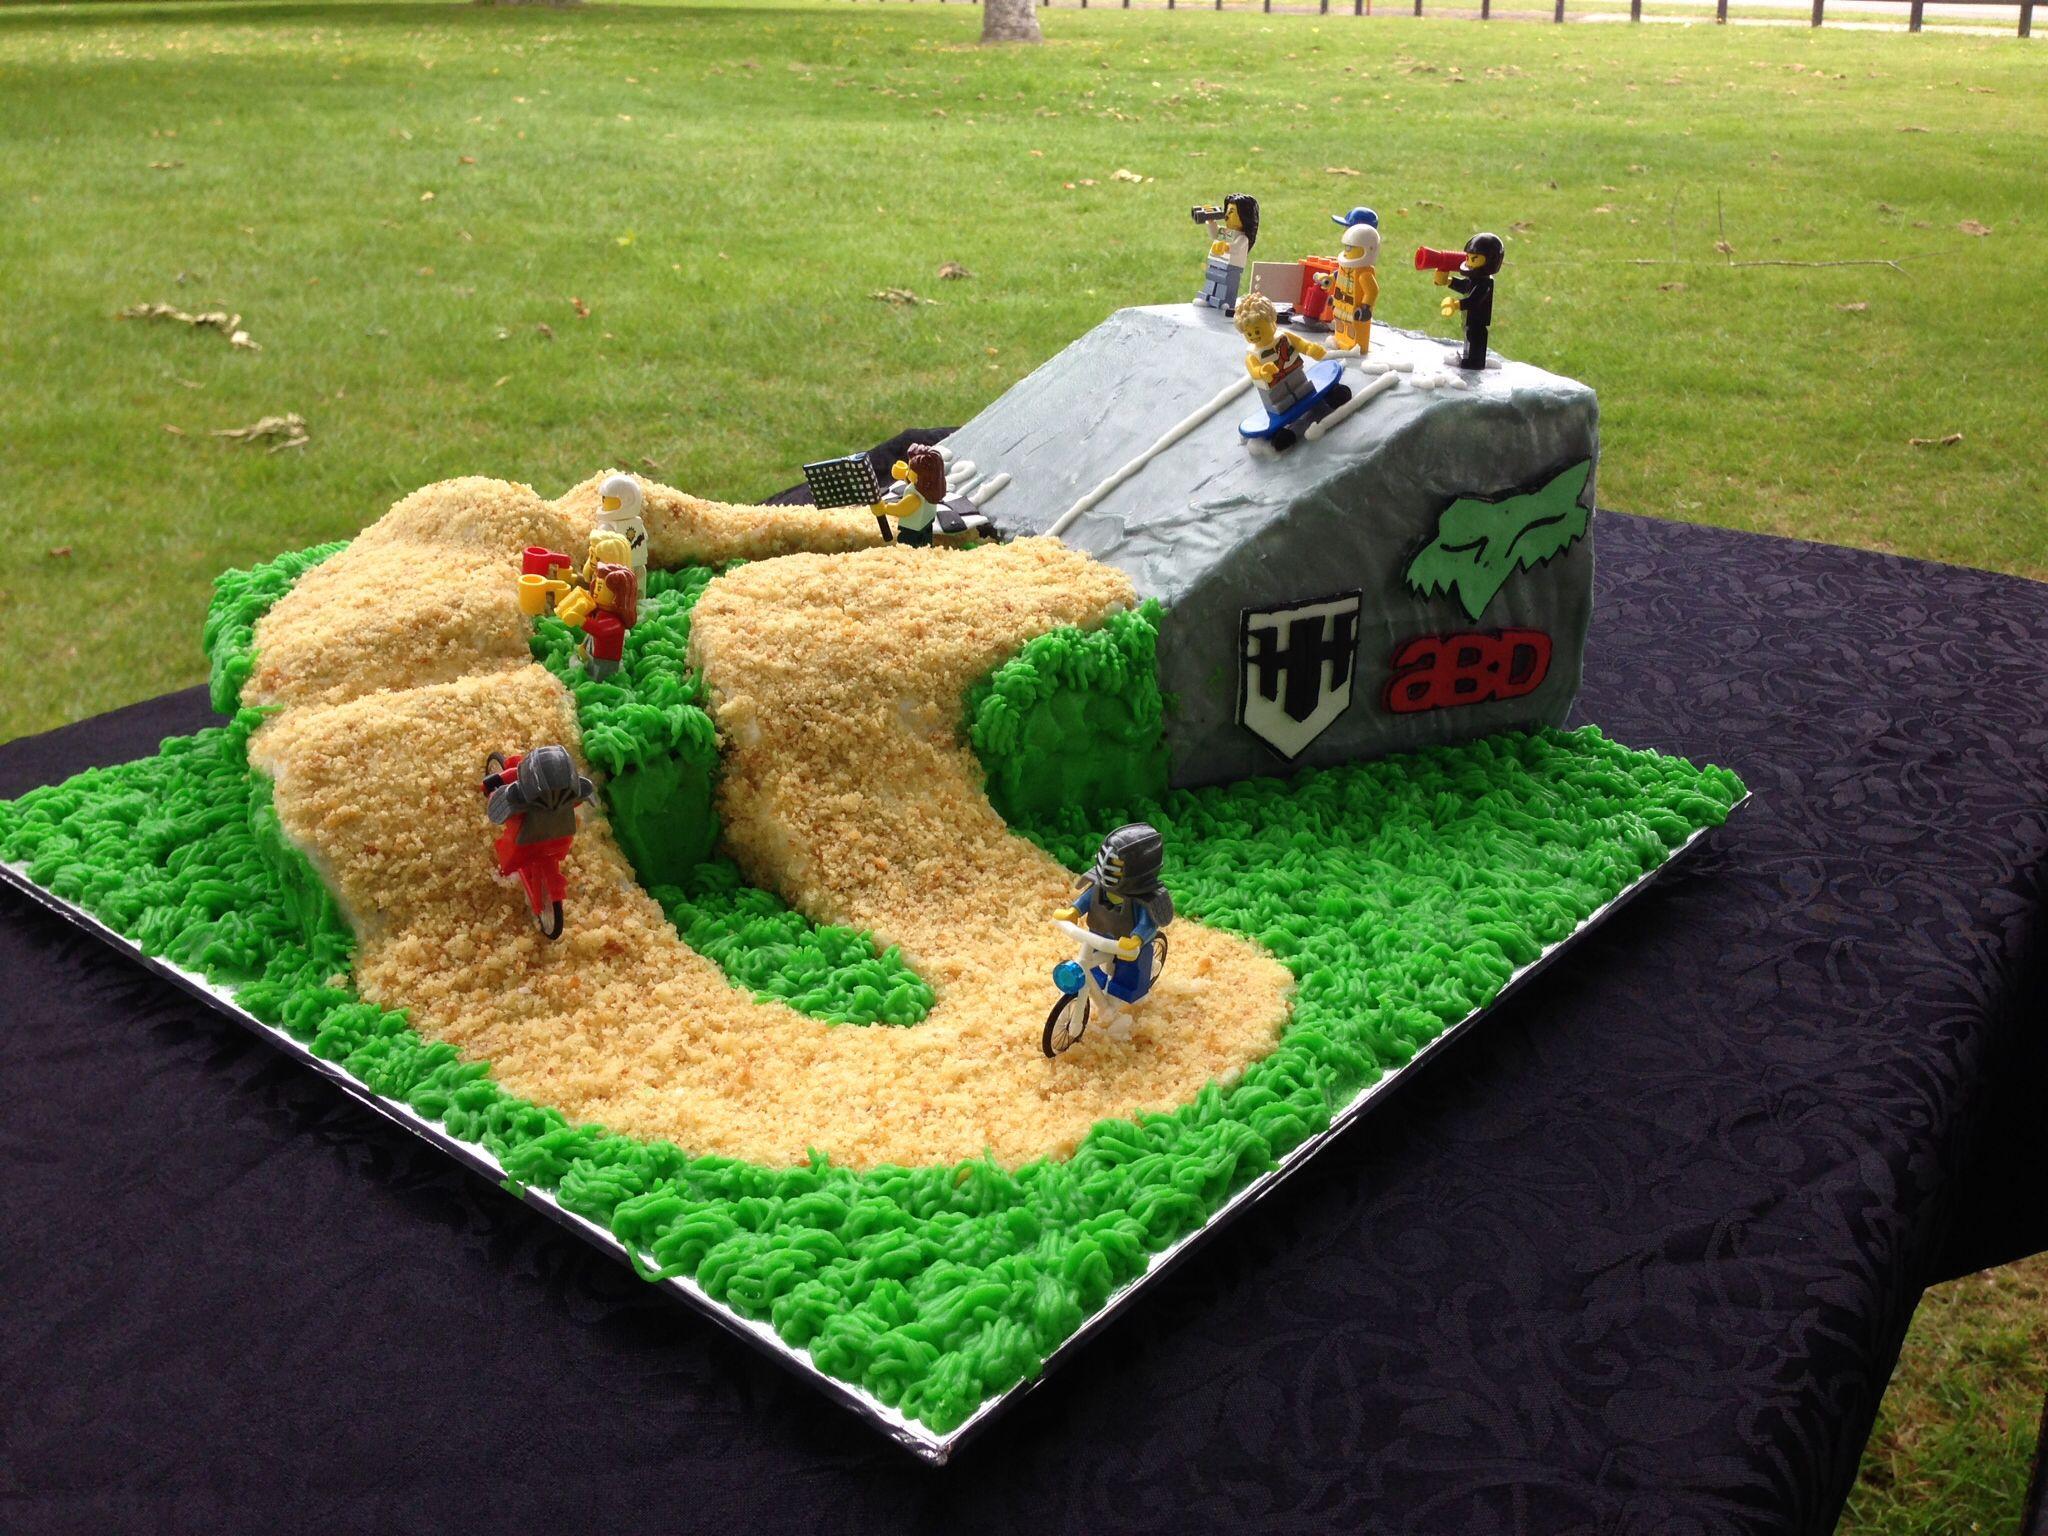 Cake Decorating Dirt Bike Track : Owain s 7th birthday cake - BMX track with Lego bikes ...